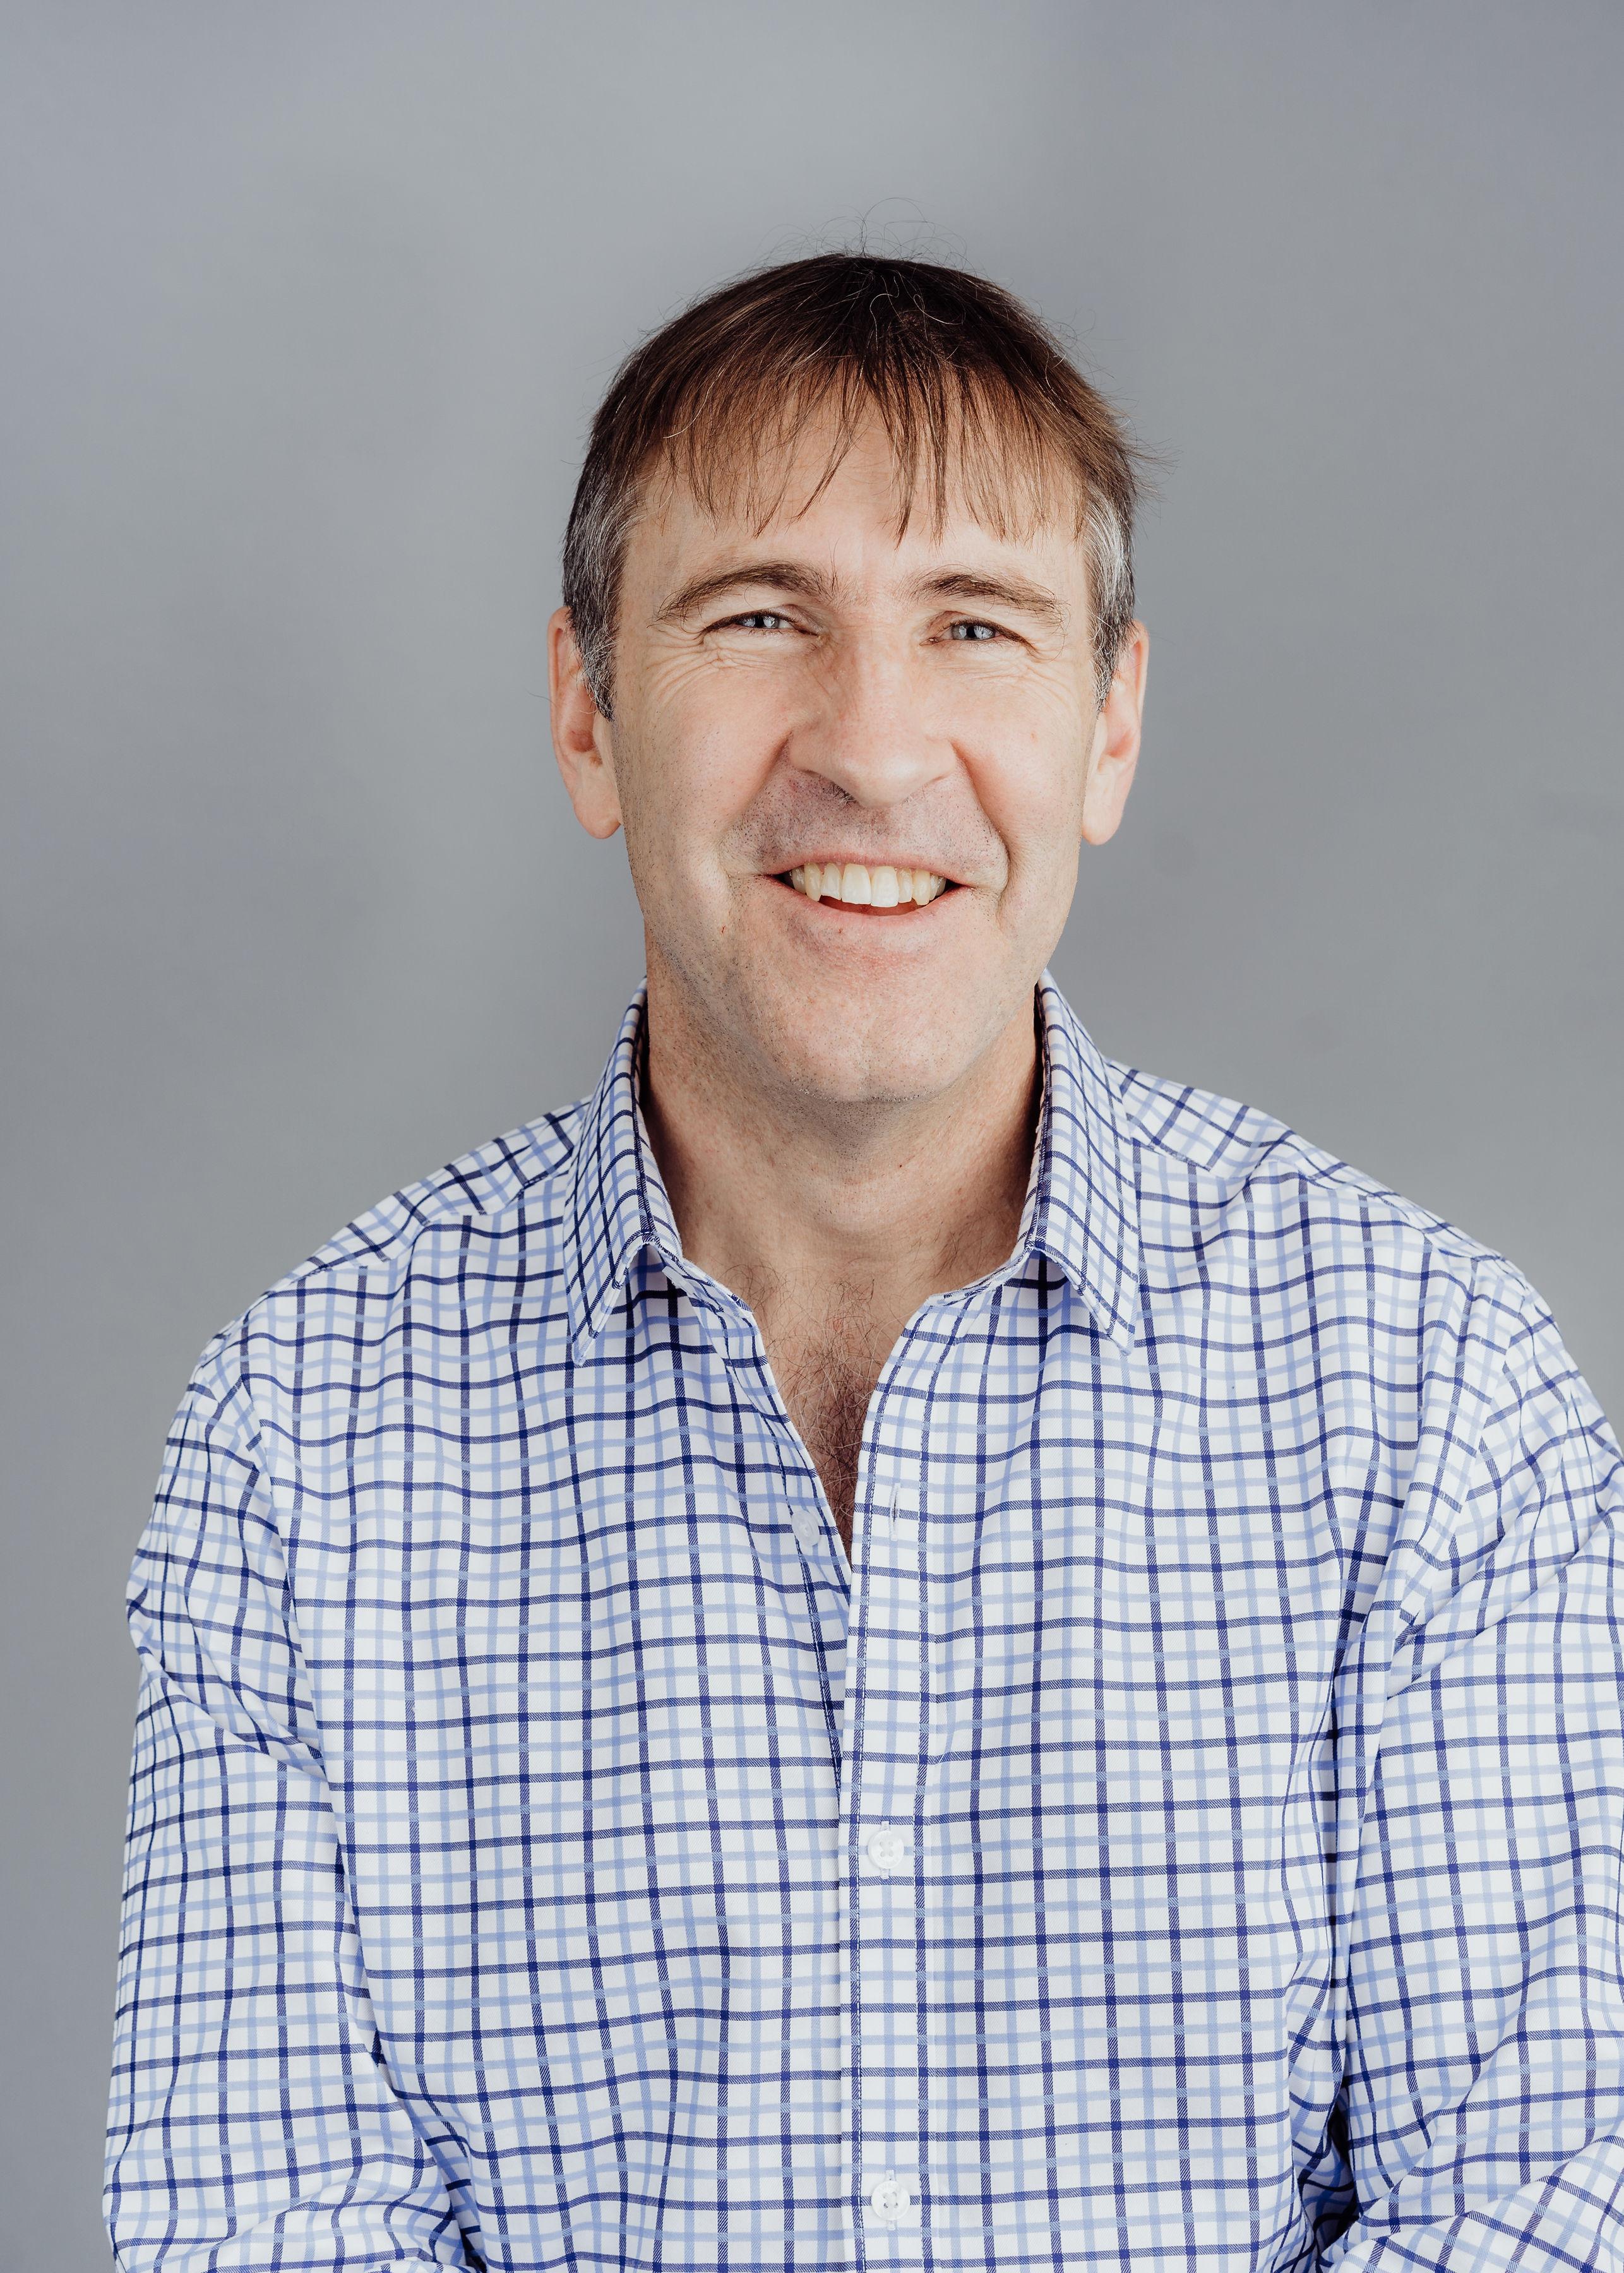 John Russell